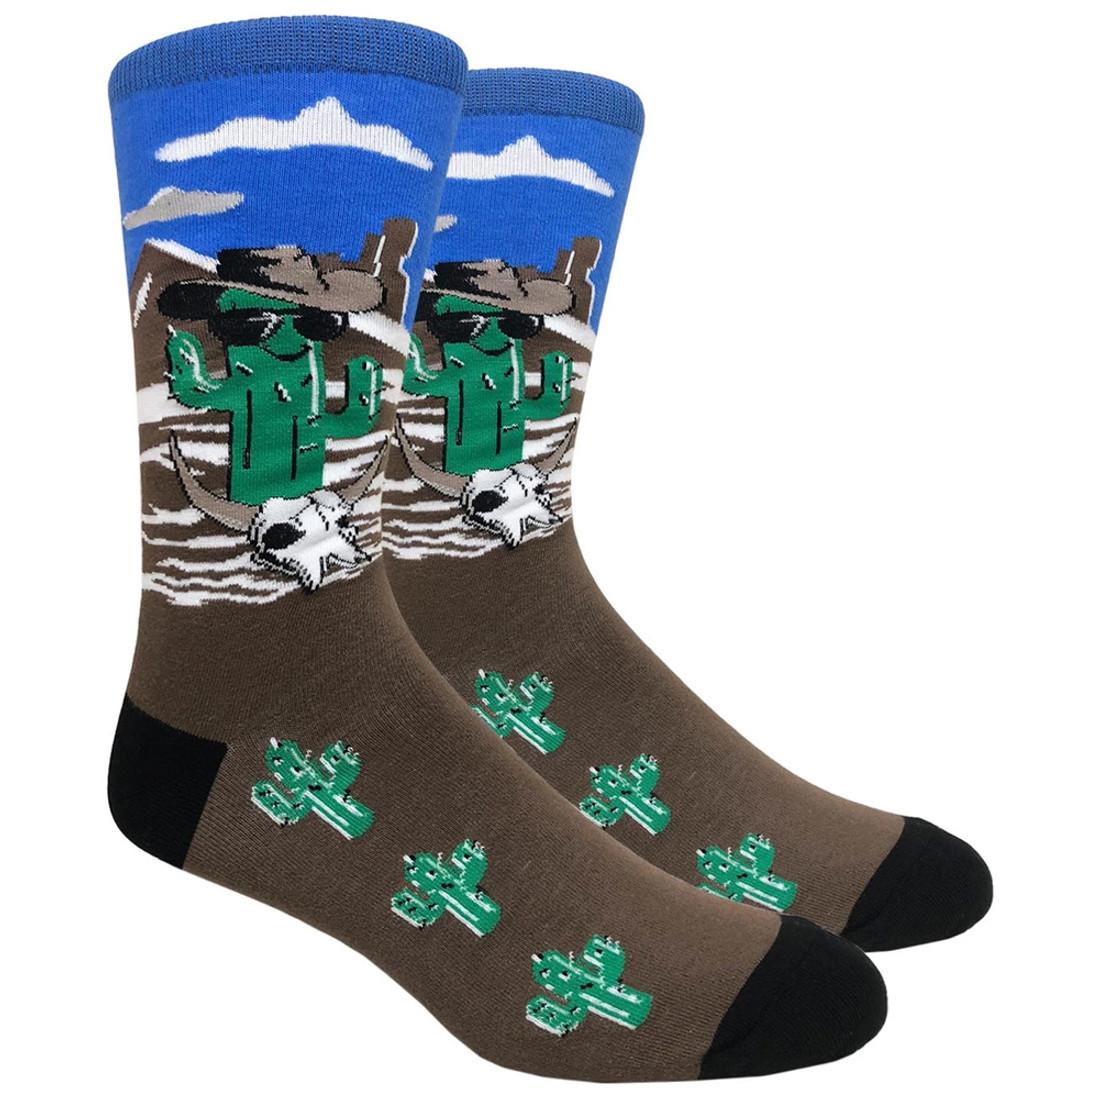 Cool Cactus Men's Crew Socks